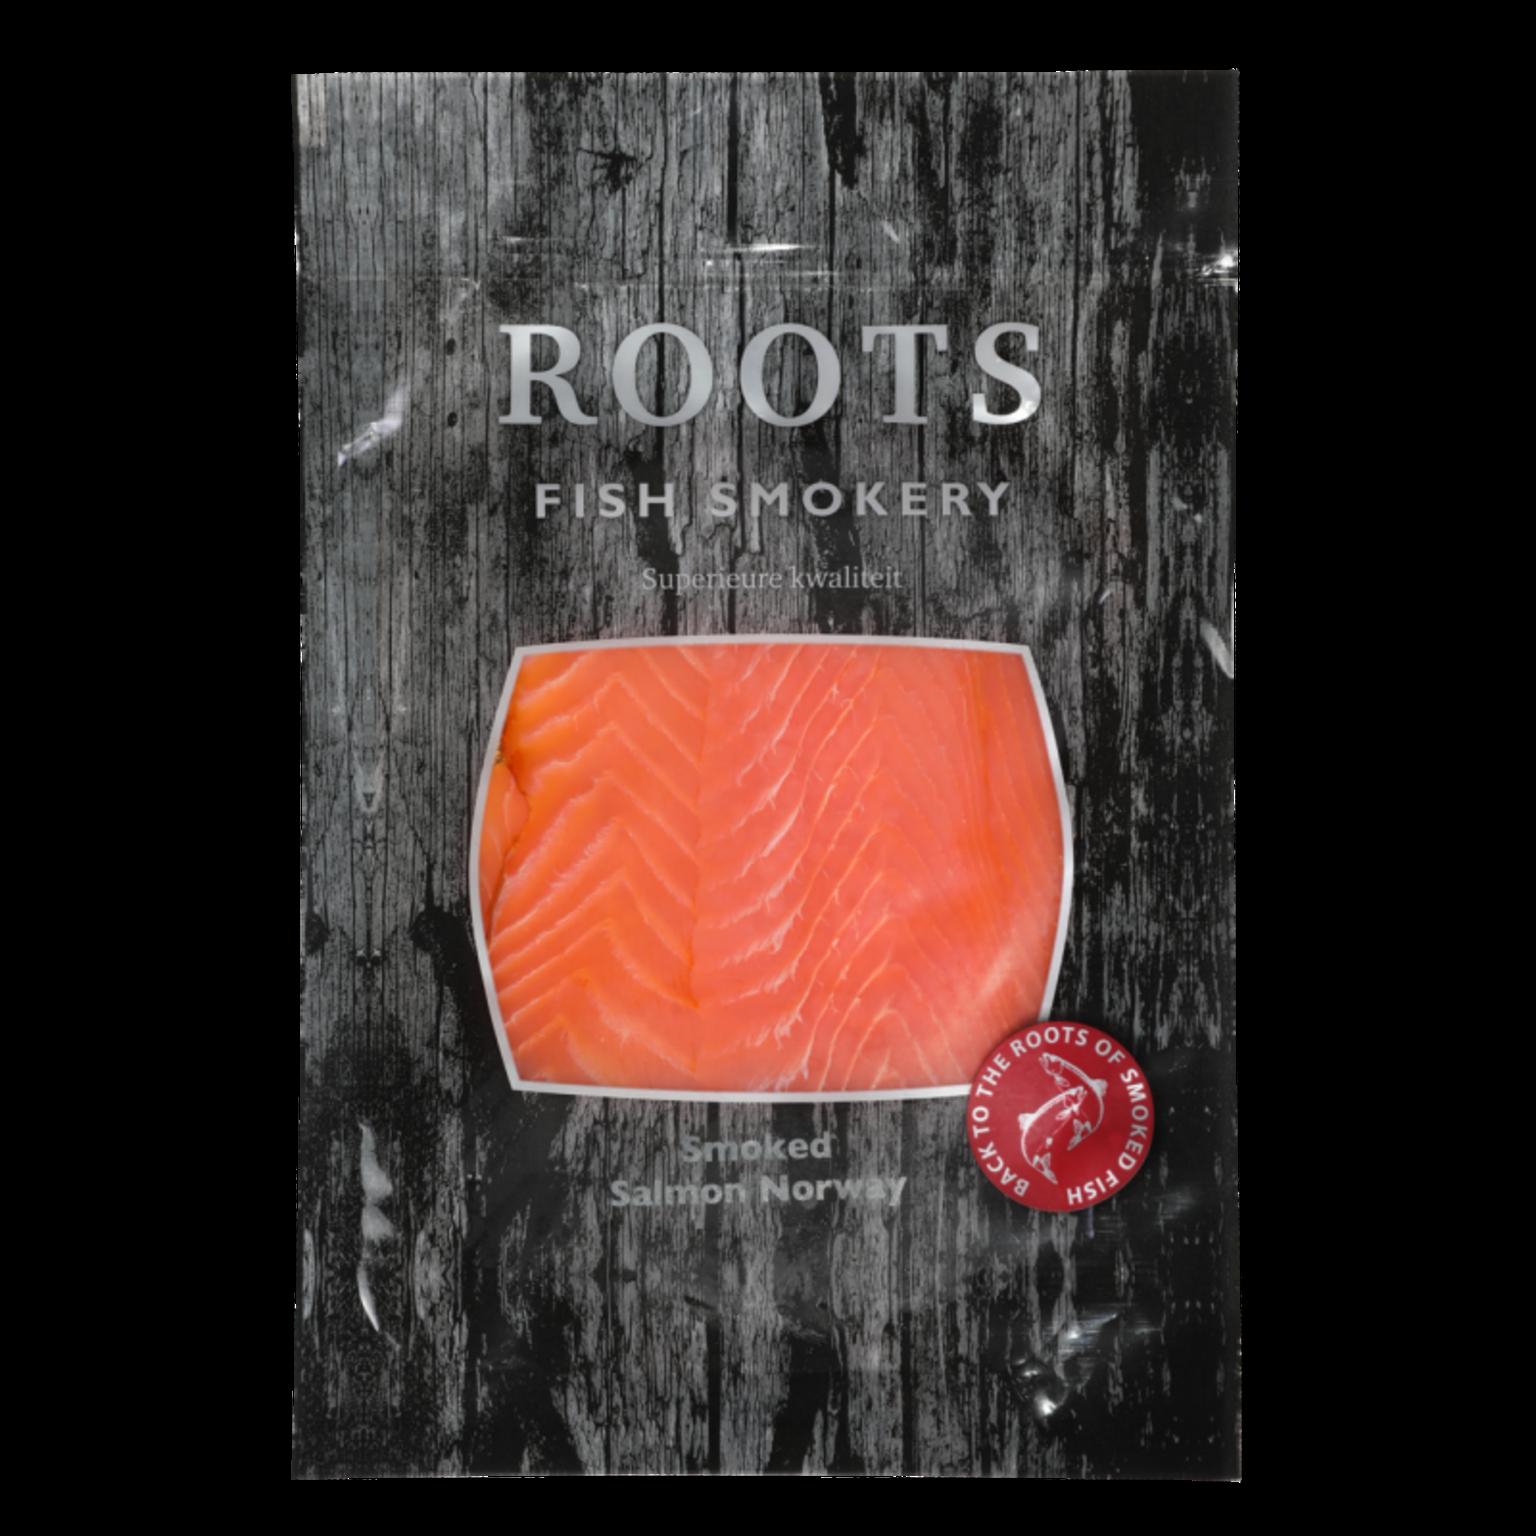 Roots smoked salmon 200g